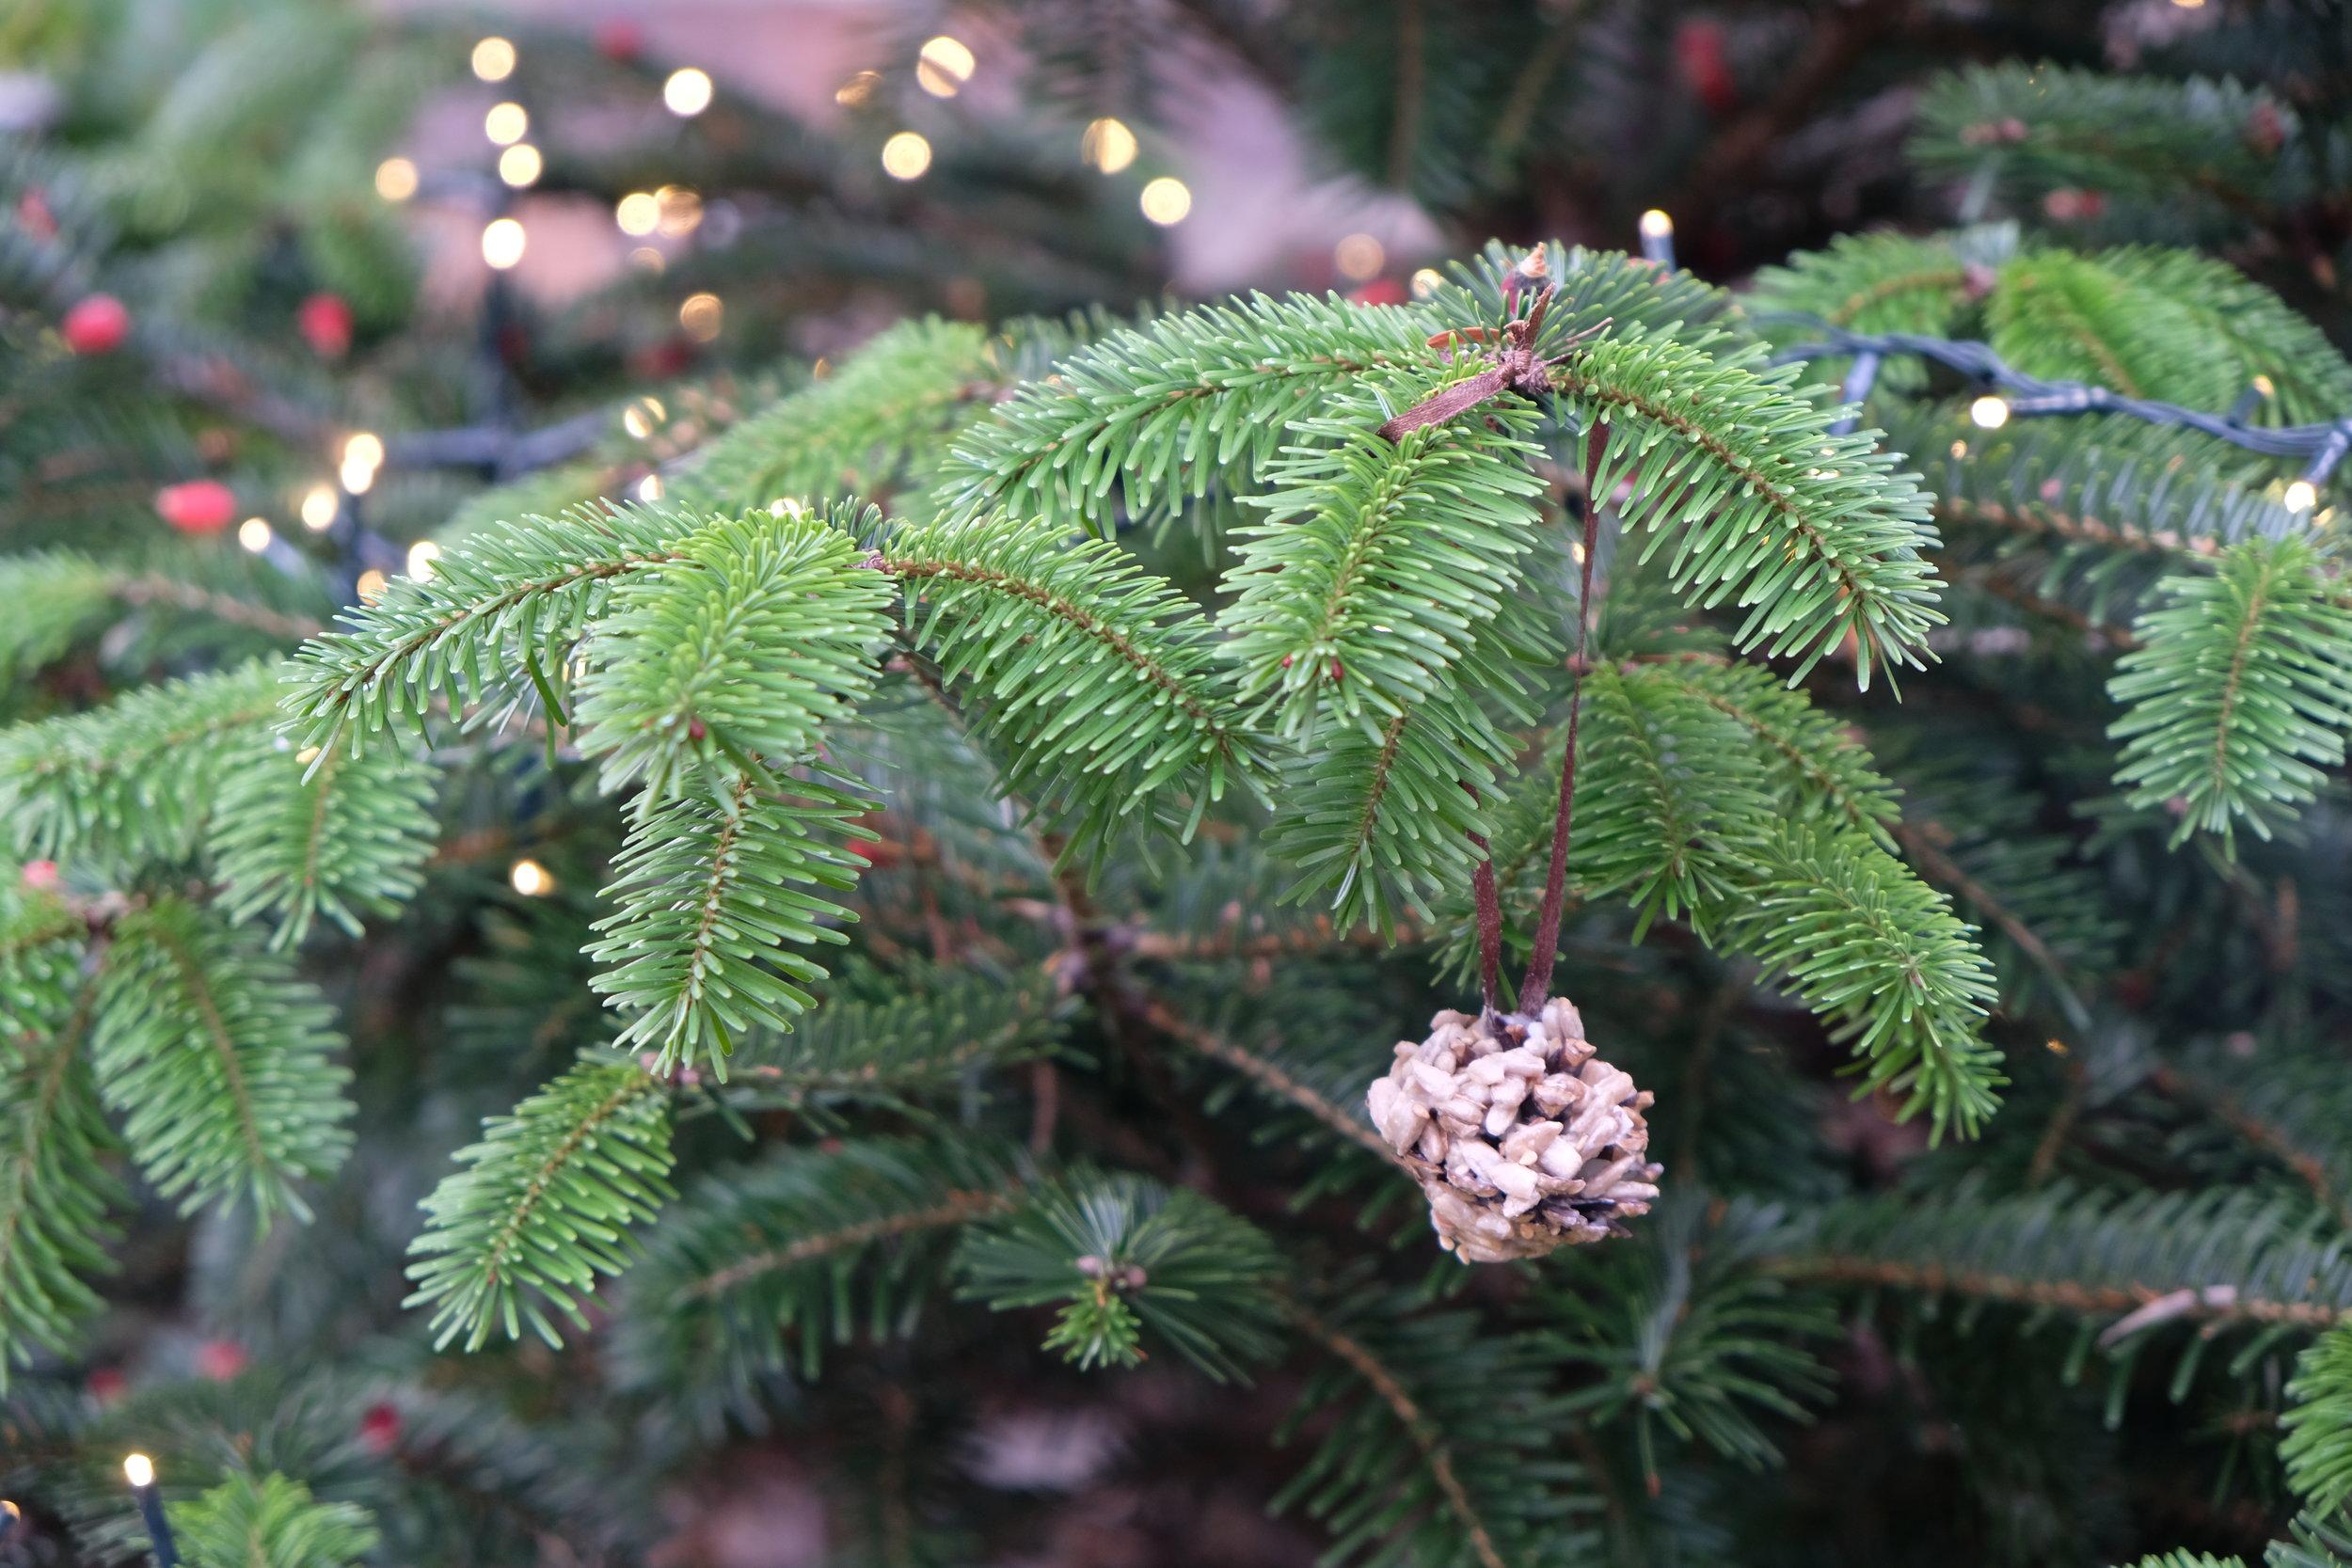 Christmas Tree Living.A Christmas Tree For Living Things Diy Bird Feeders